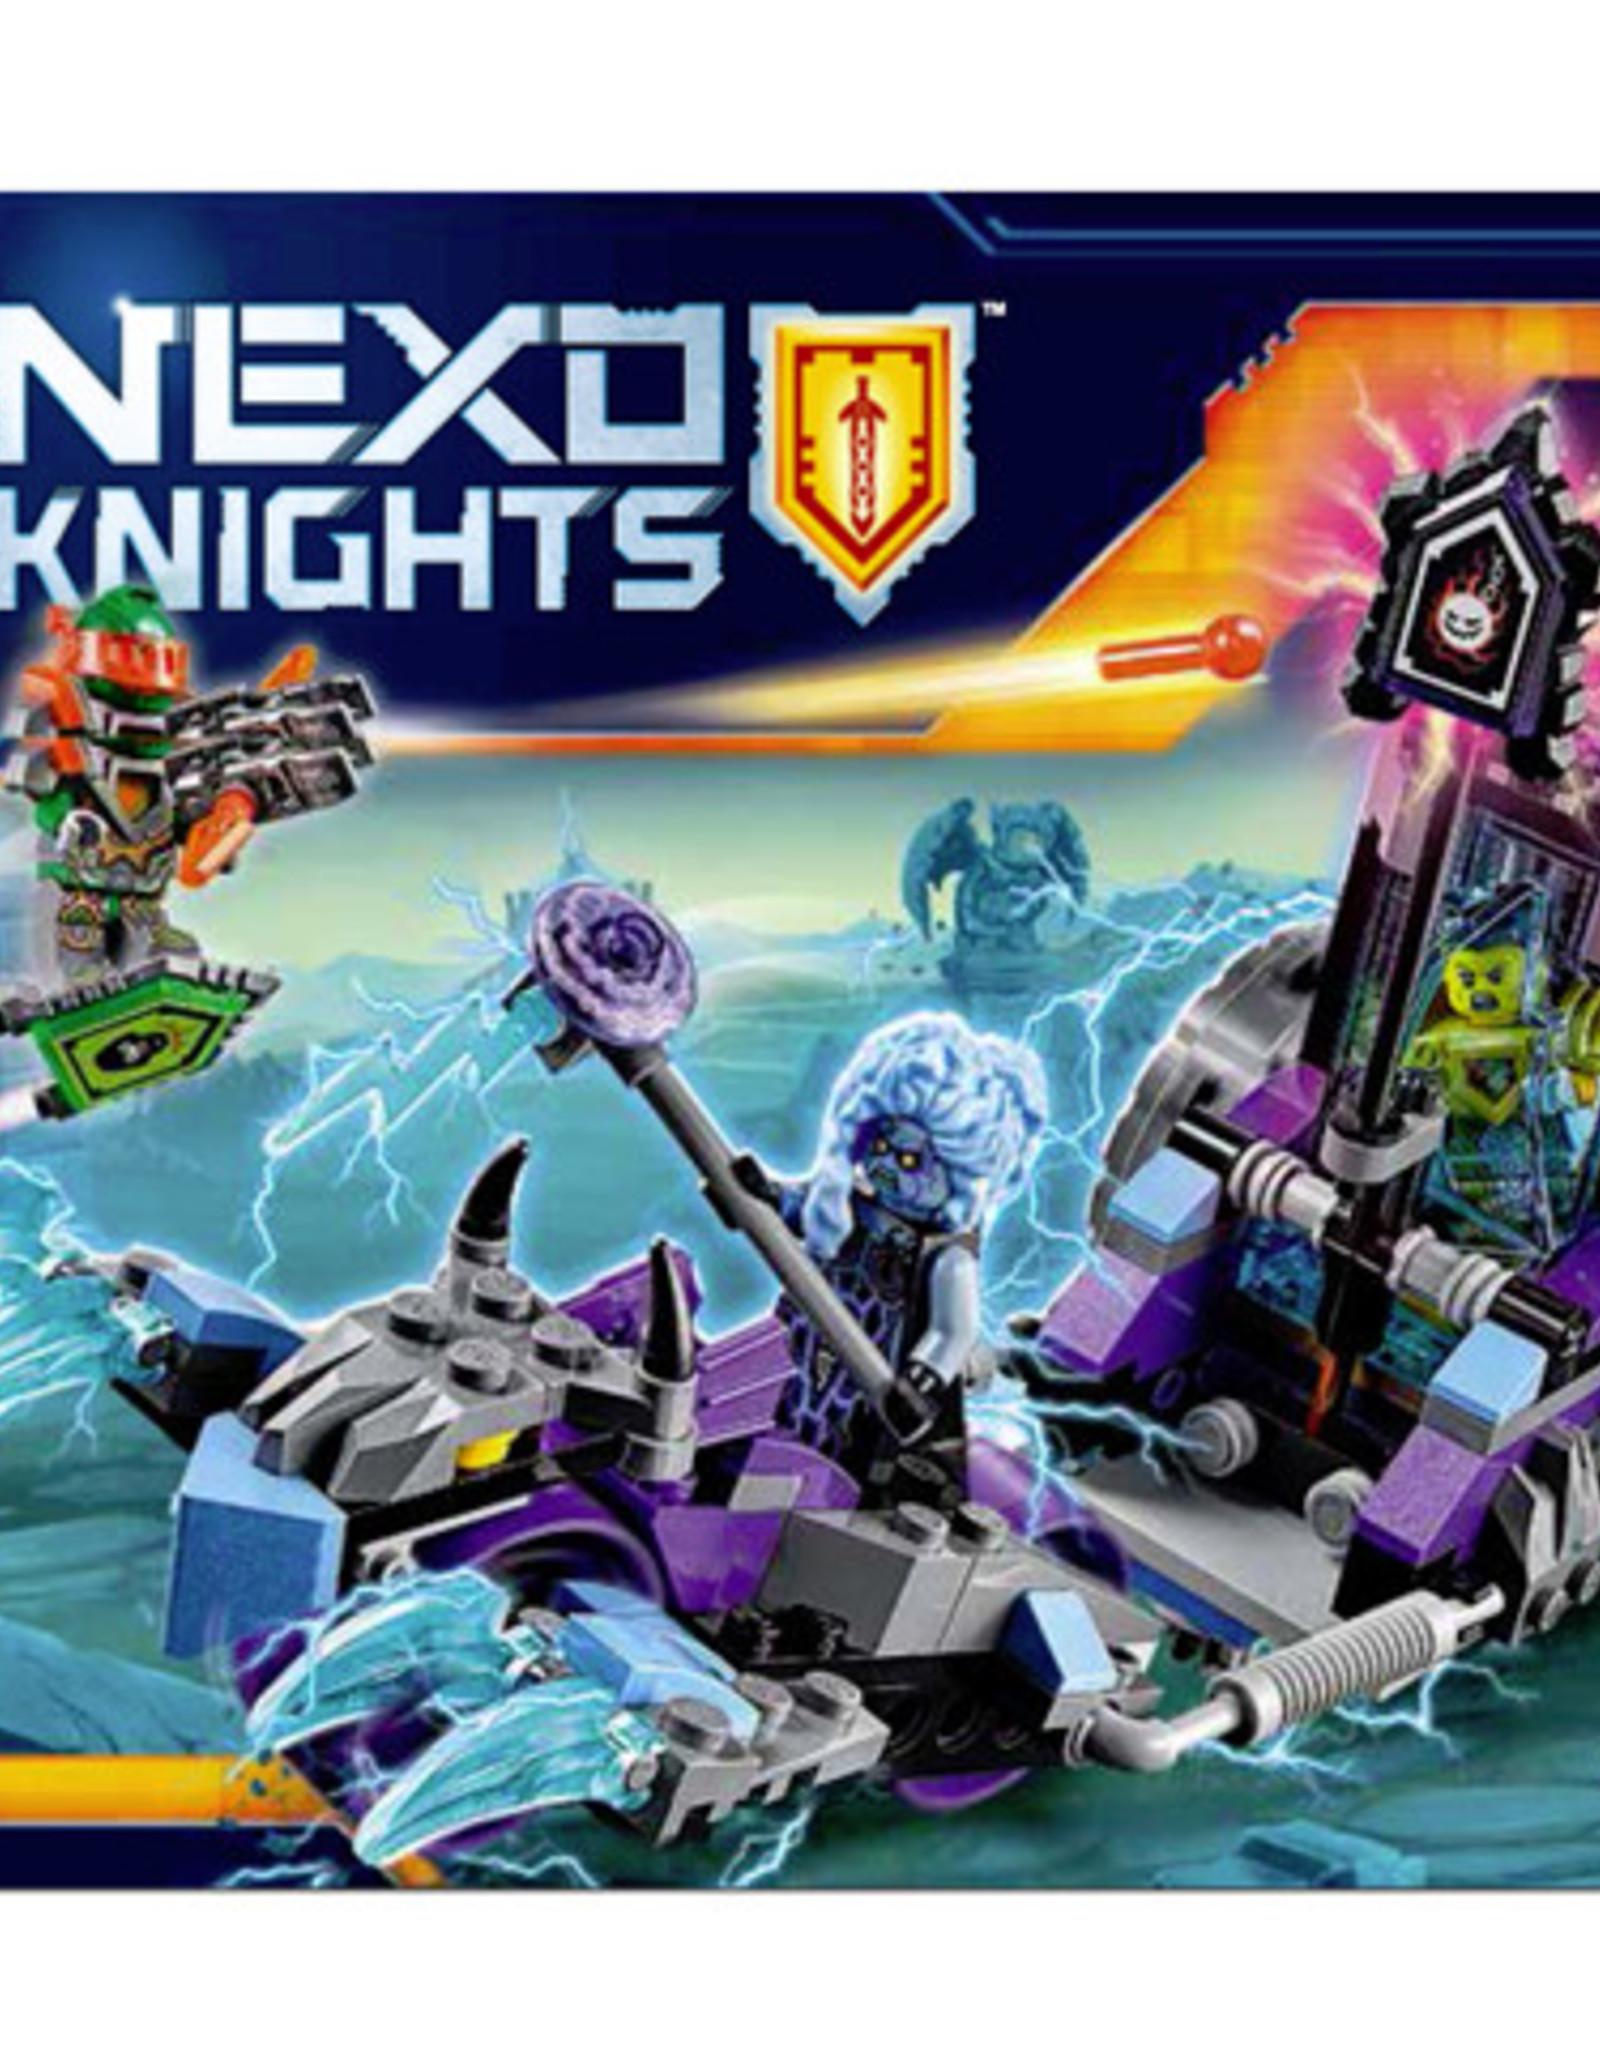 LEGO LEGO 70349 Ruina's Lock & Roller NEXO KNIGHTS